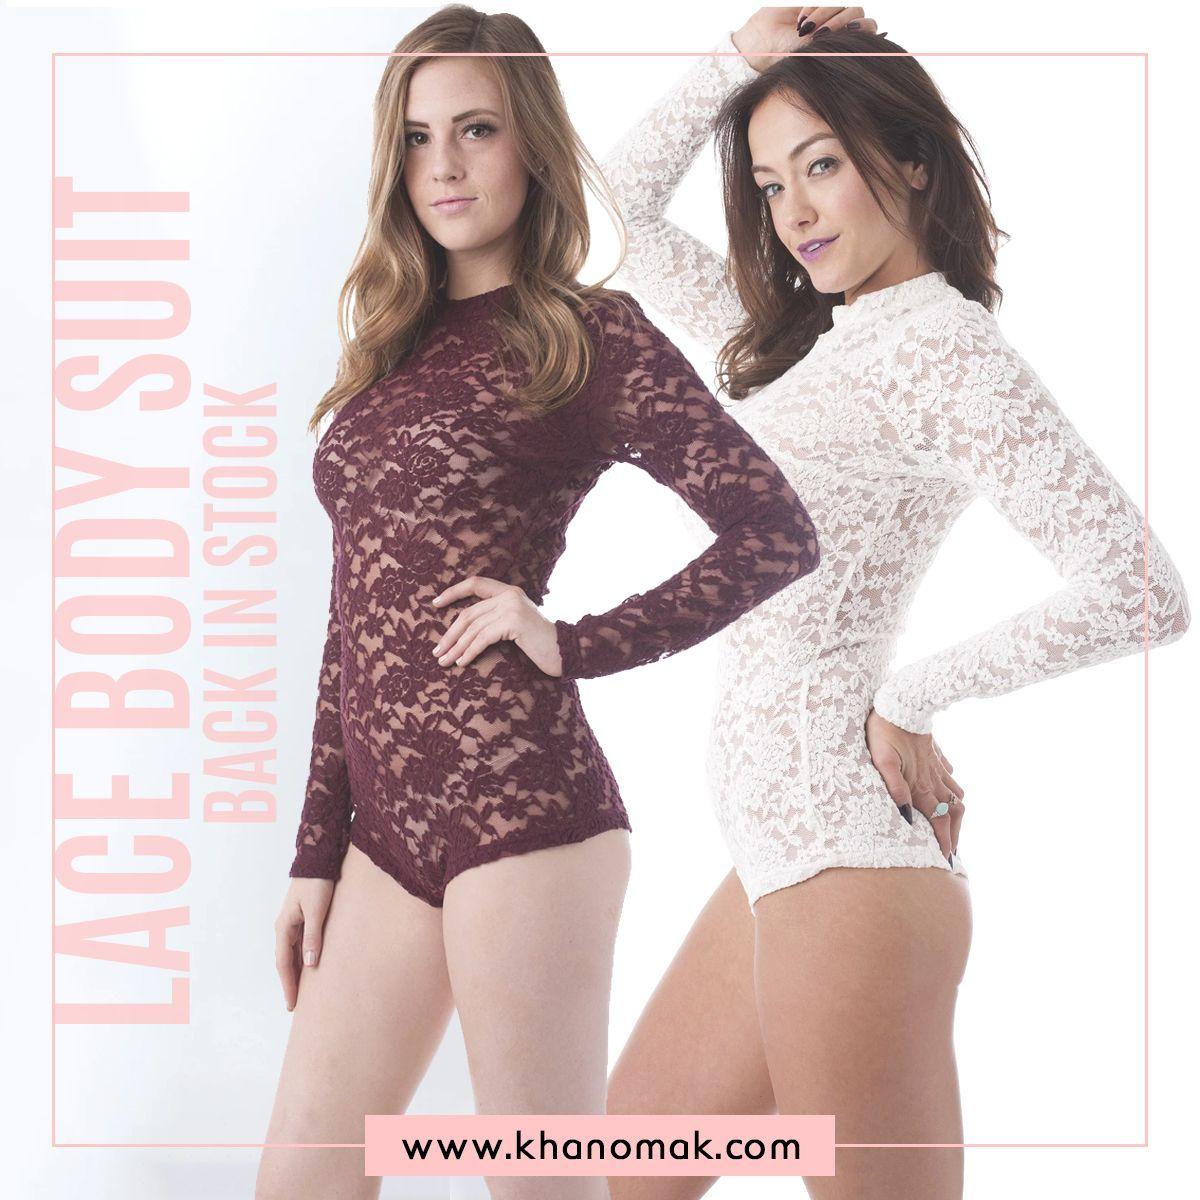 Khanomak Junior Size Long Sleeve All Lace Mock Neck Bodysuit